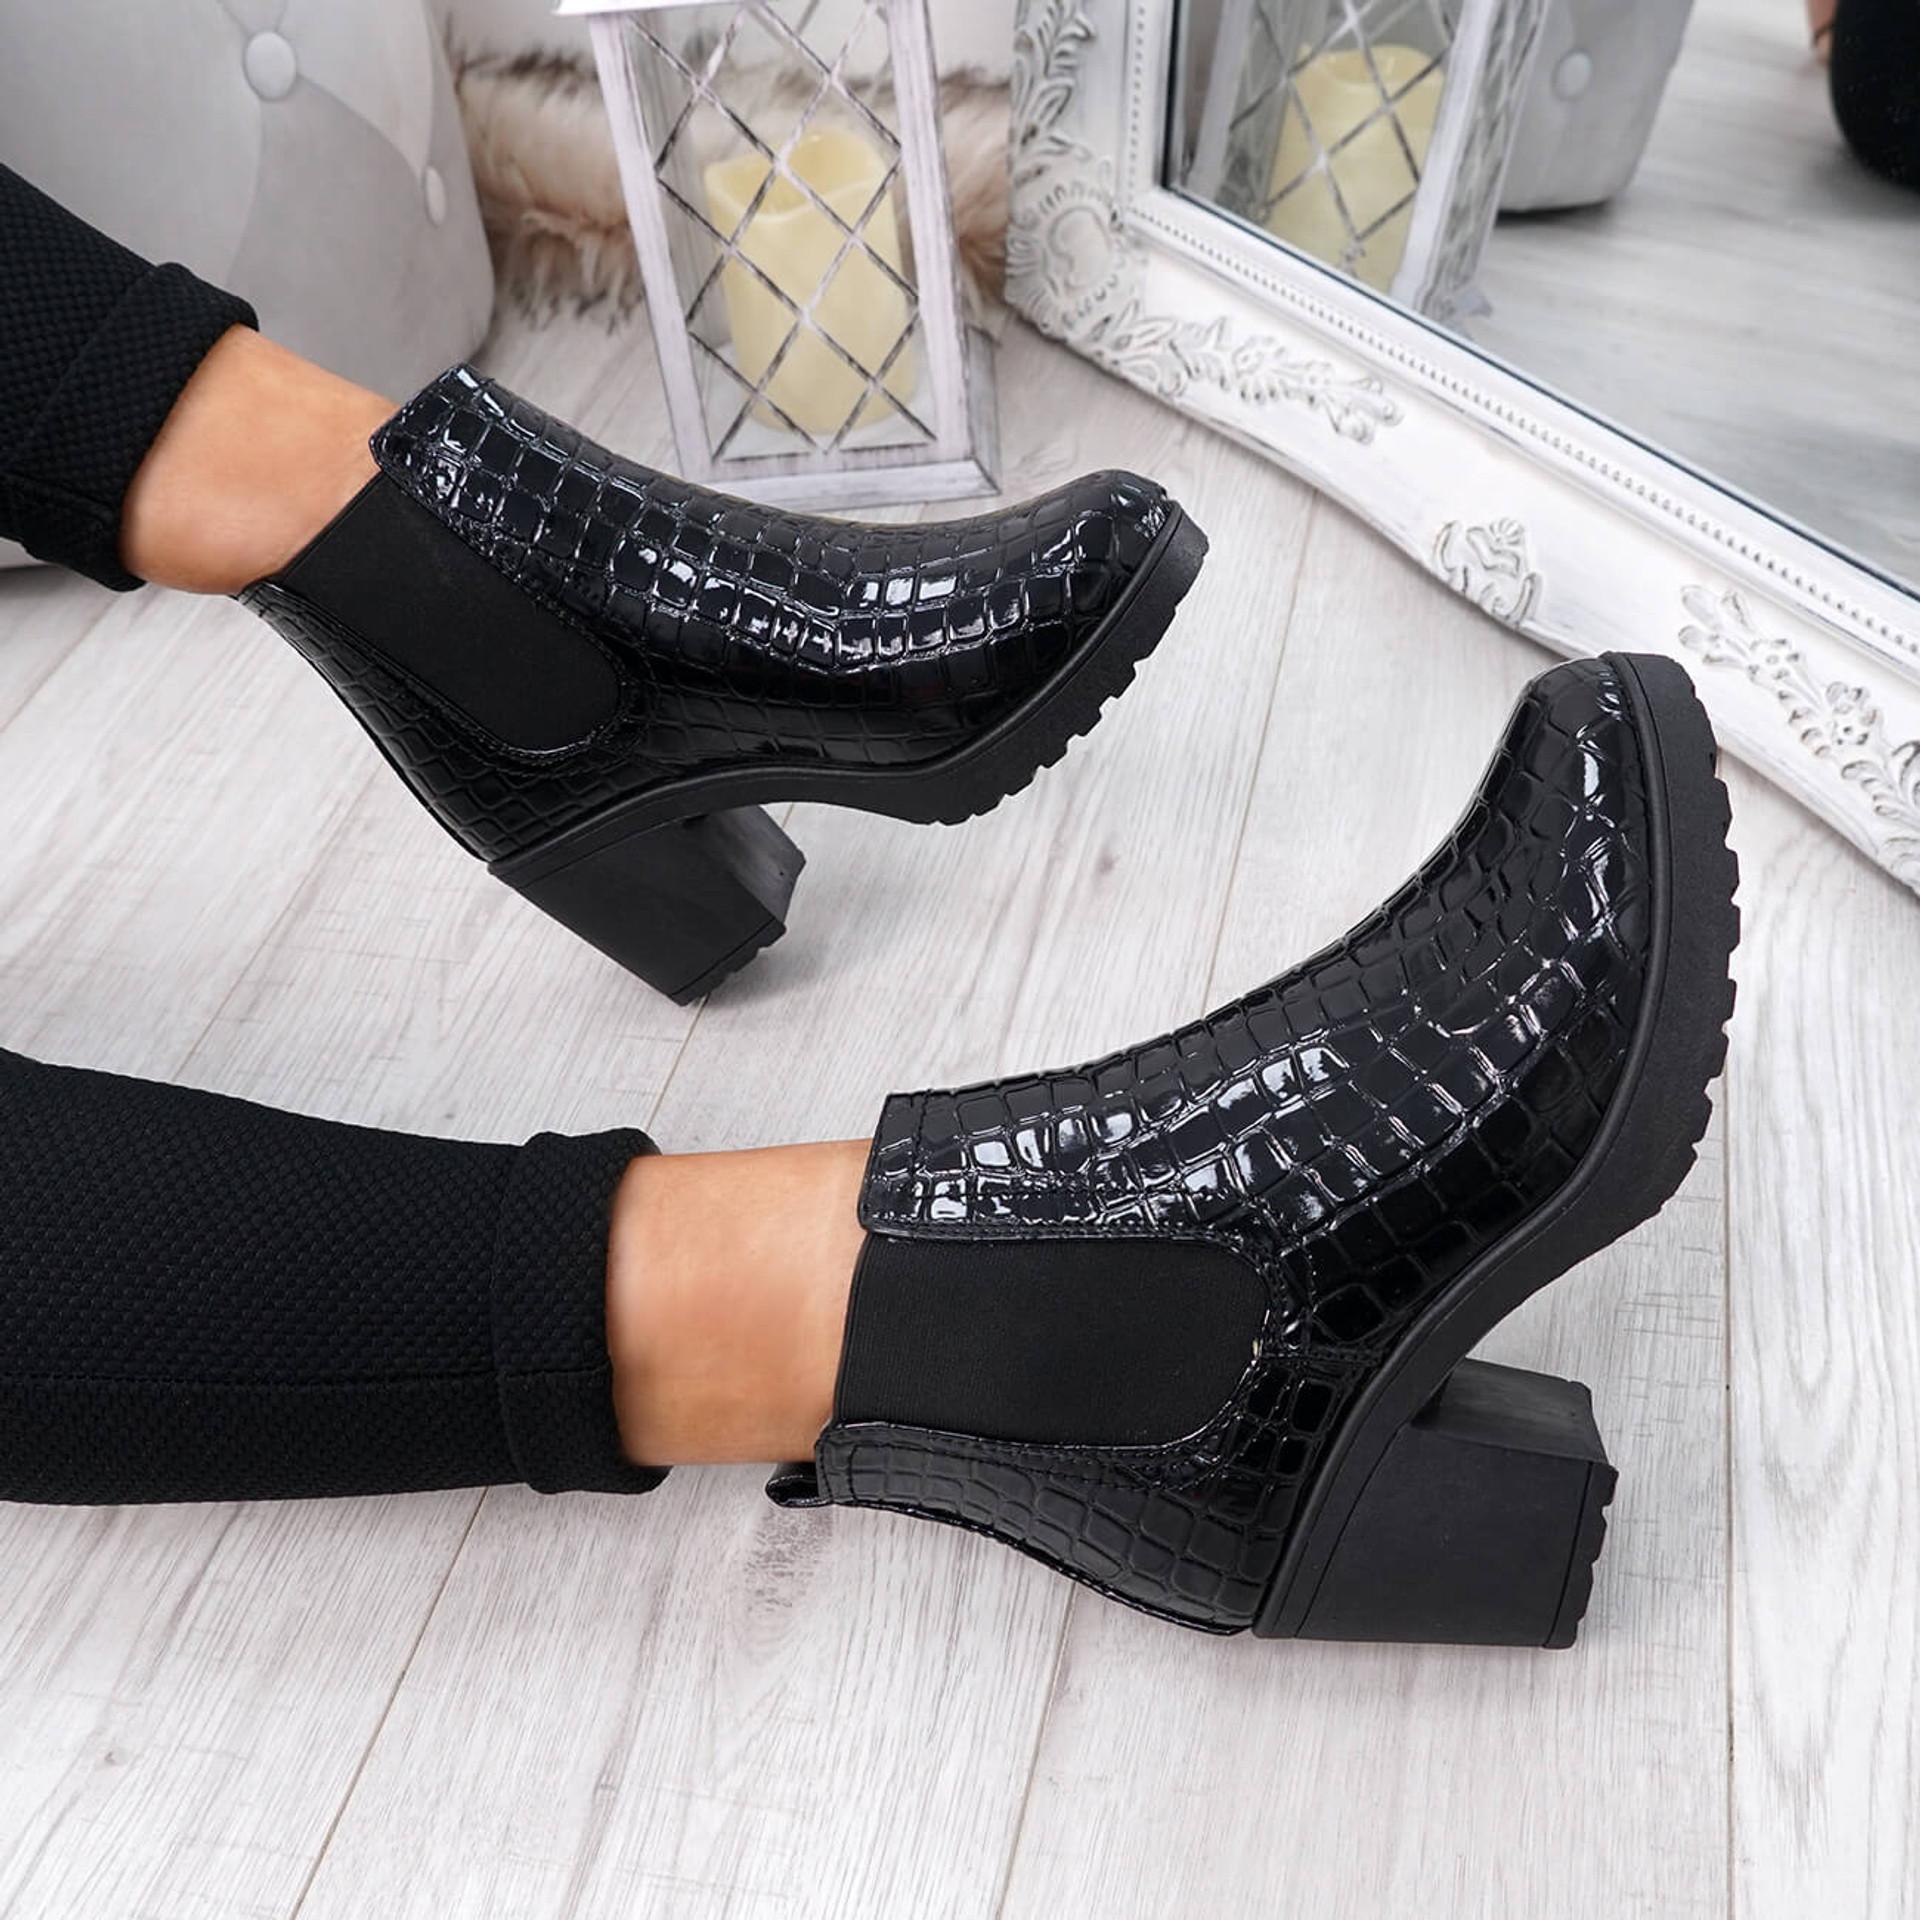 Zimka Black Croc Skin Ankle Boots